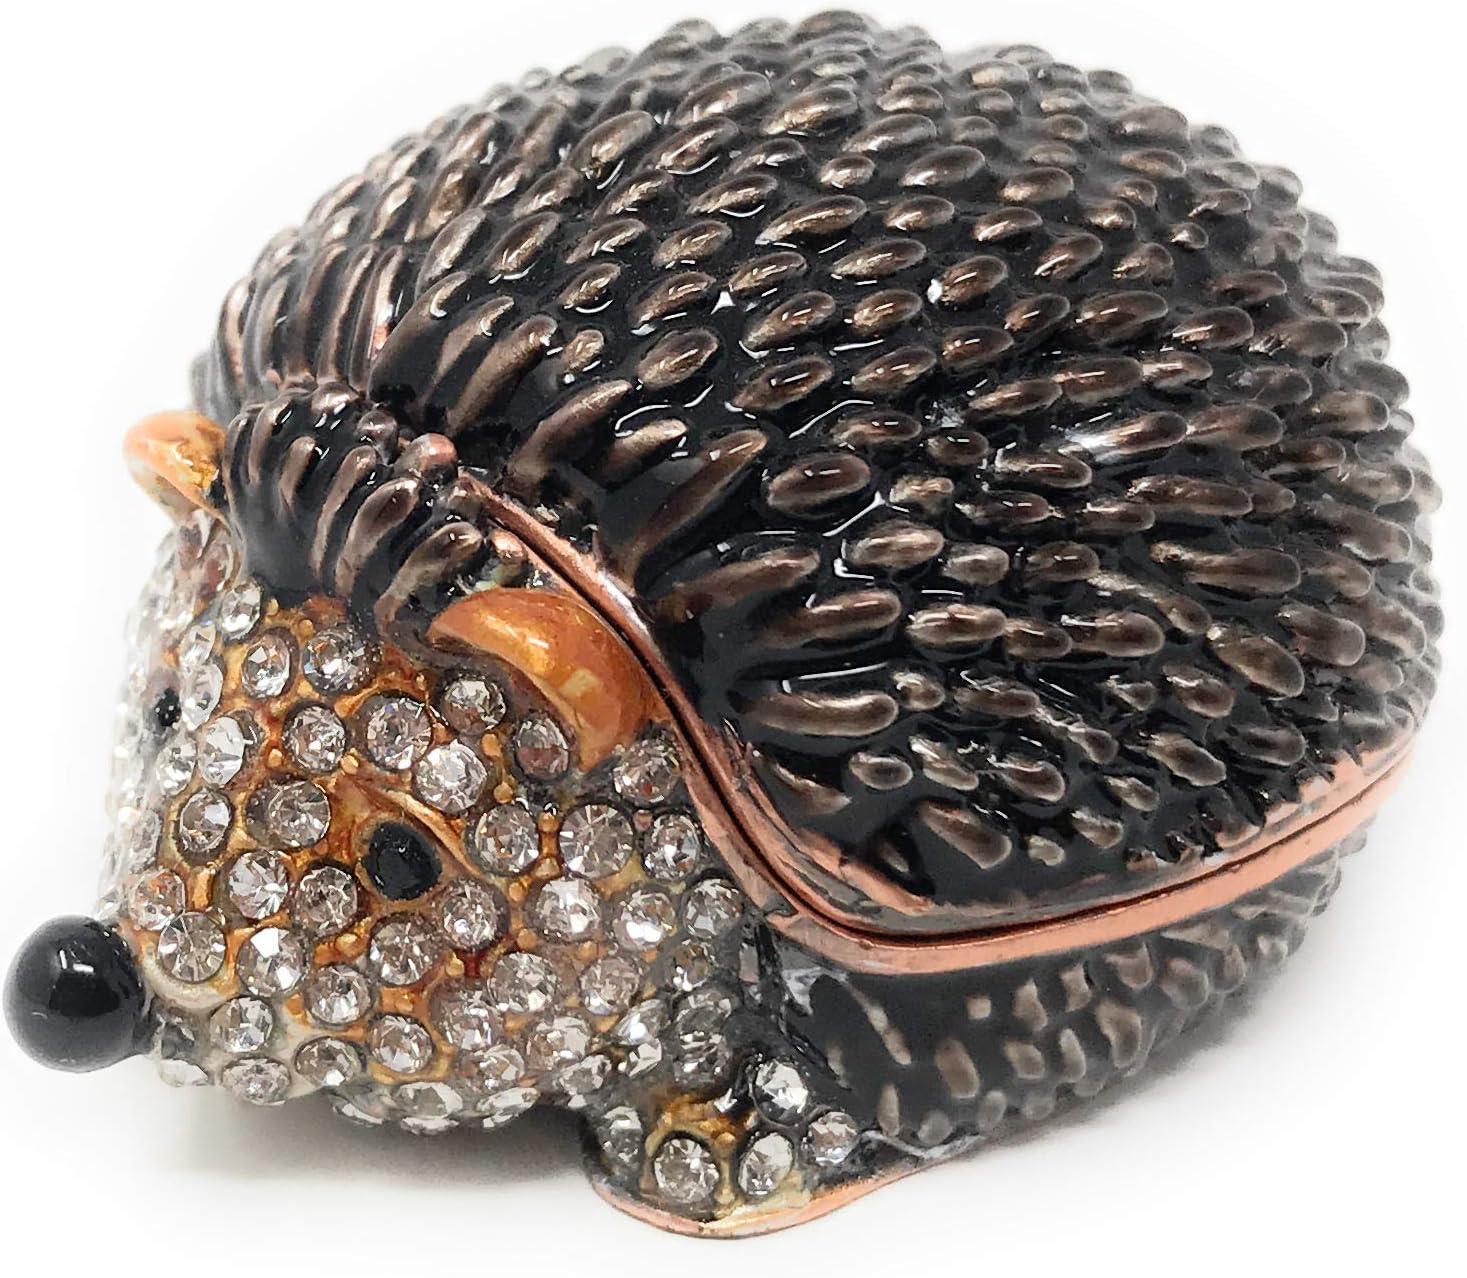 23. Enameled Hedgehog Mini Trinket Box